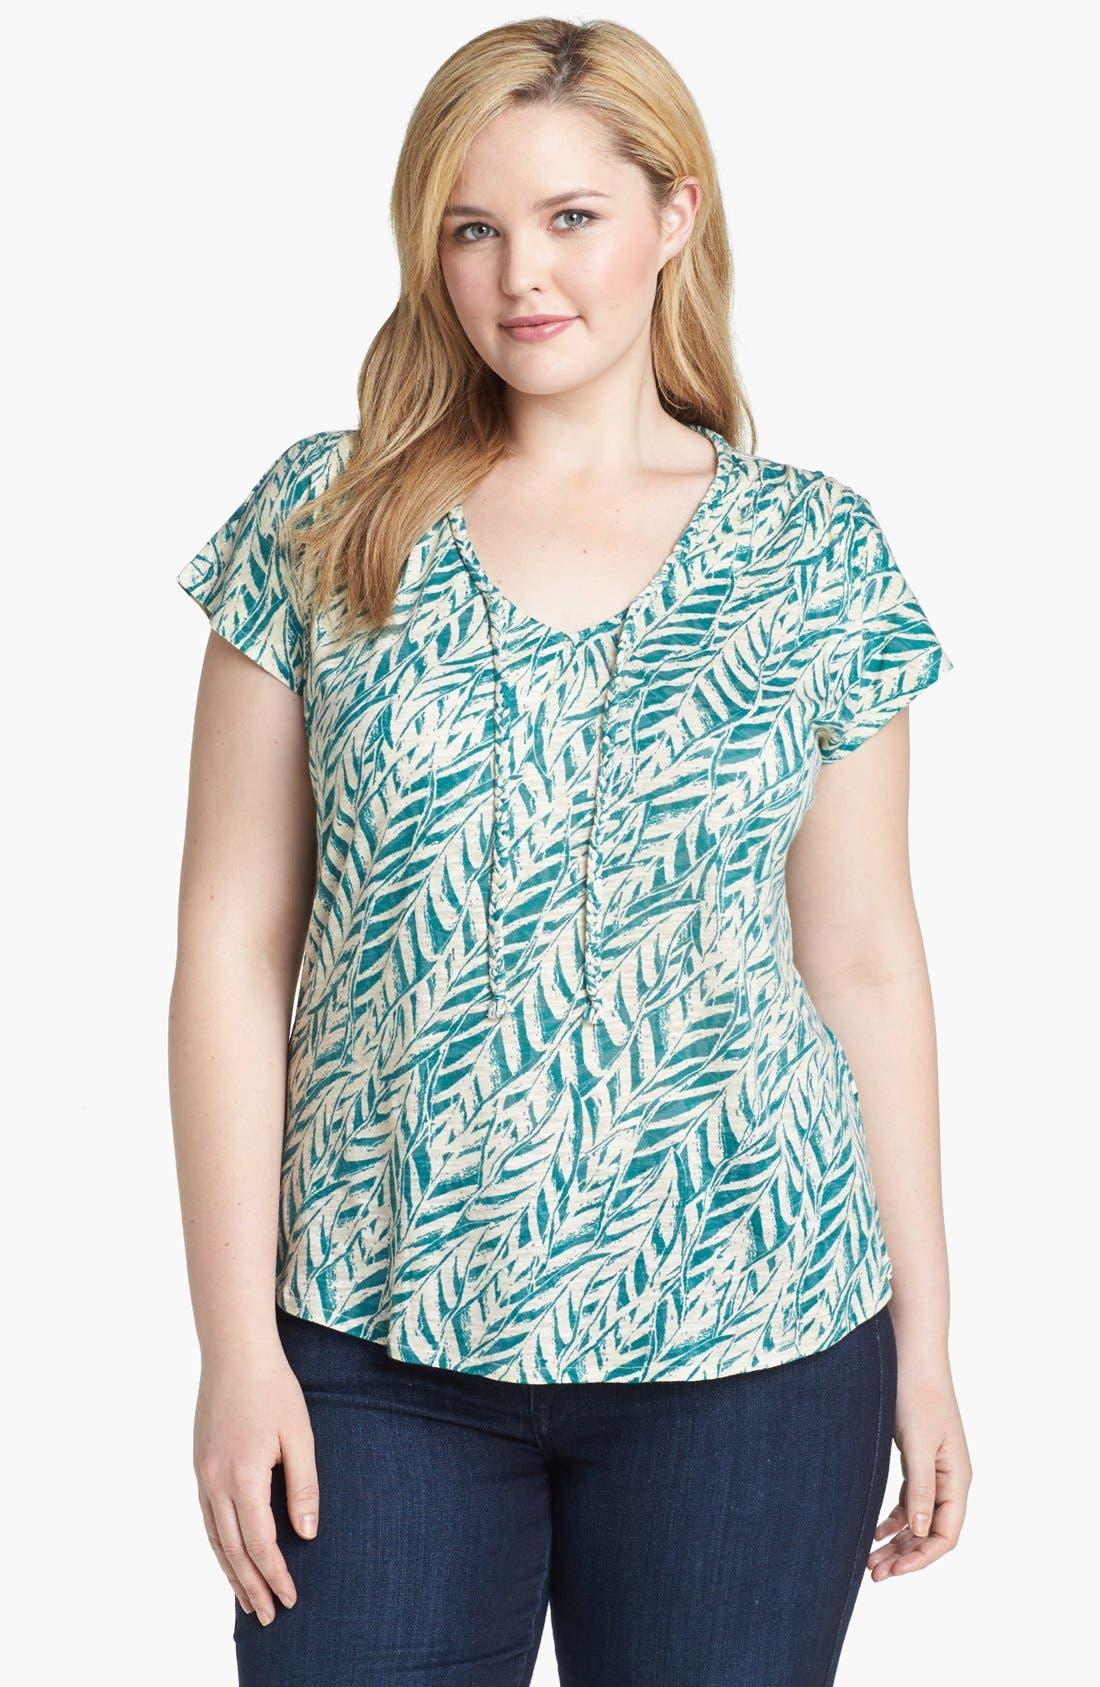 Main Image - Lucky Brand 'Myra' Tropical Print Top (Plus Size)